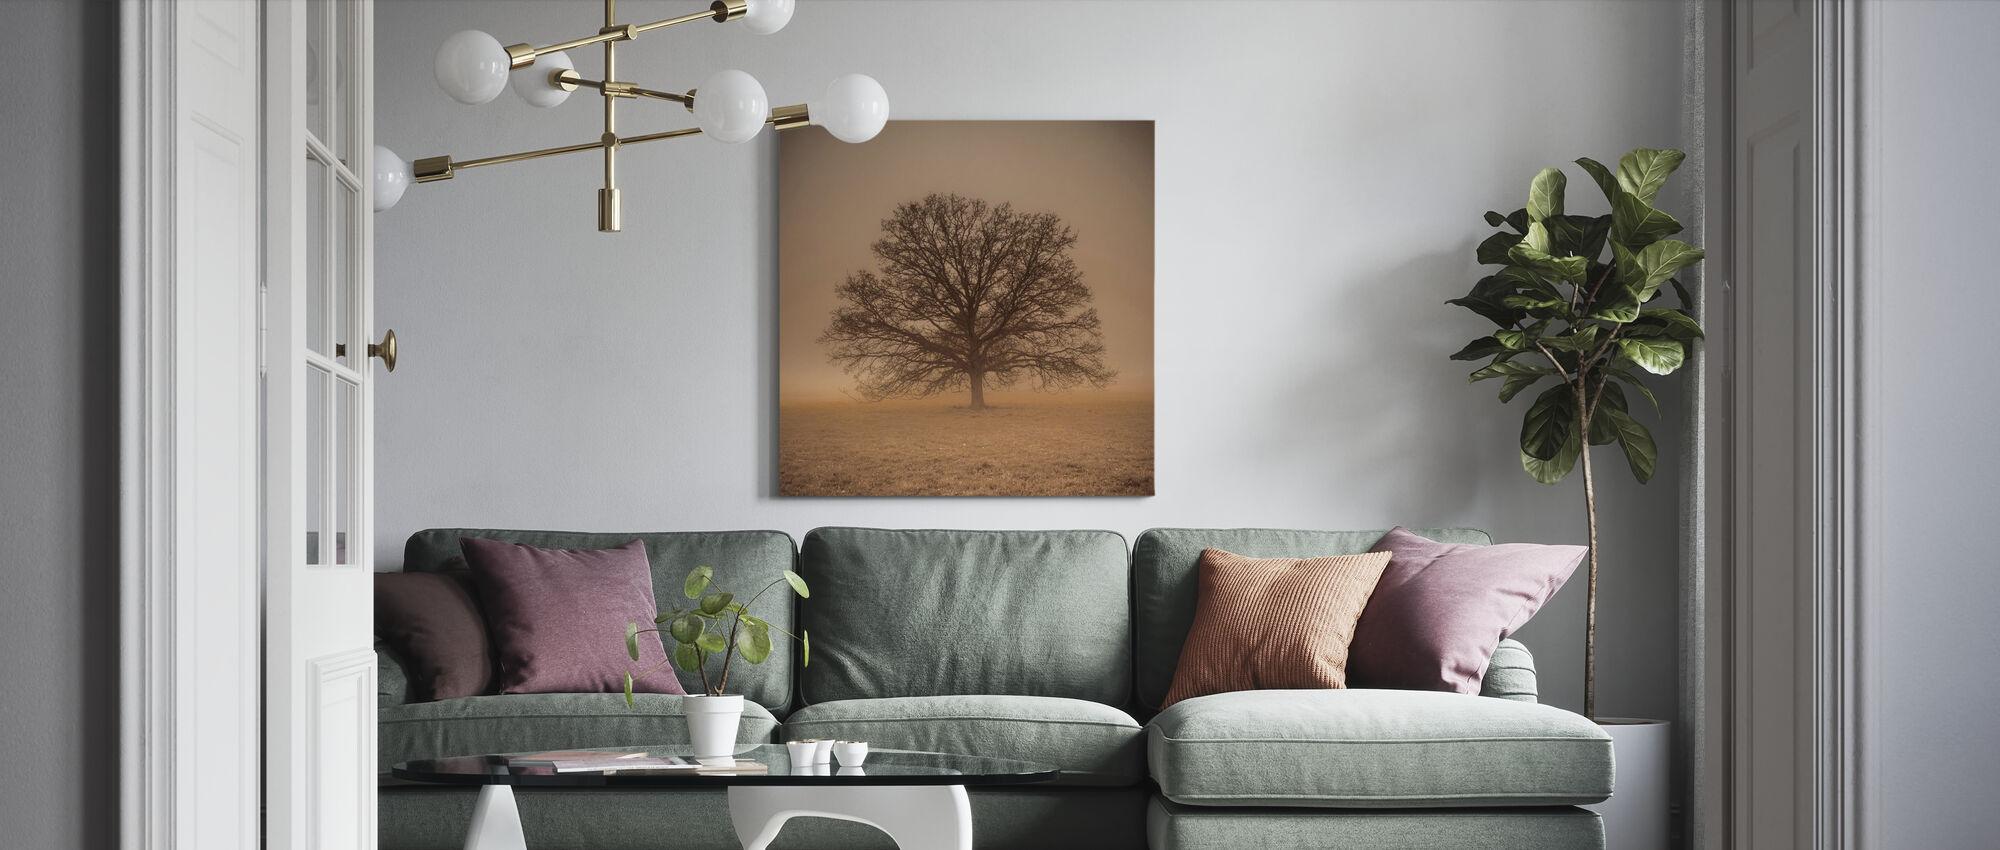 Episkt träd - Canvastavla - Vardagsrum